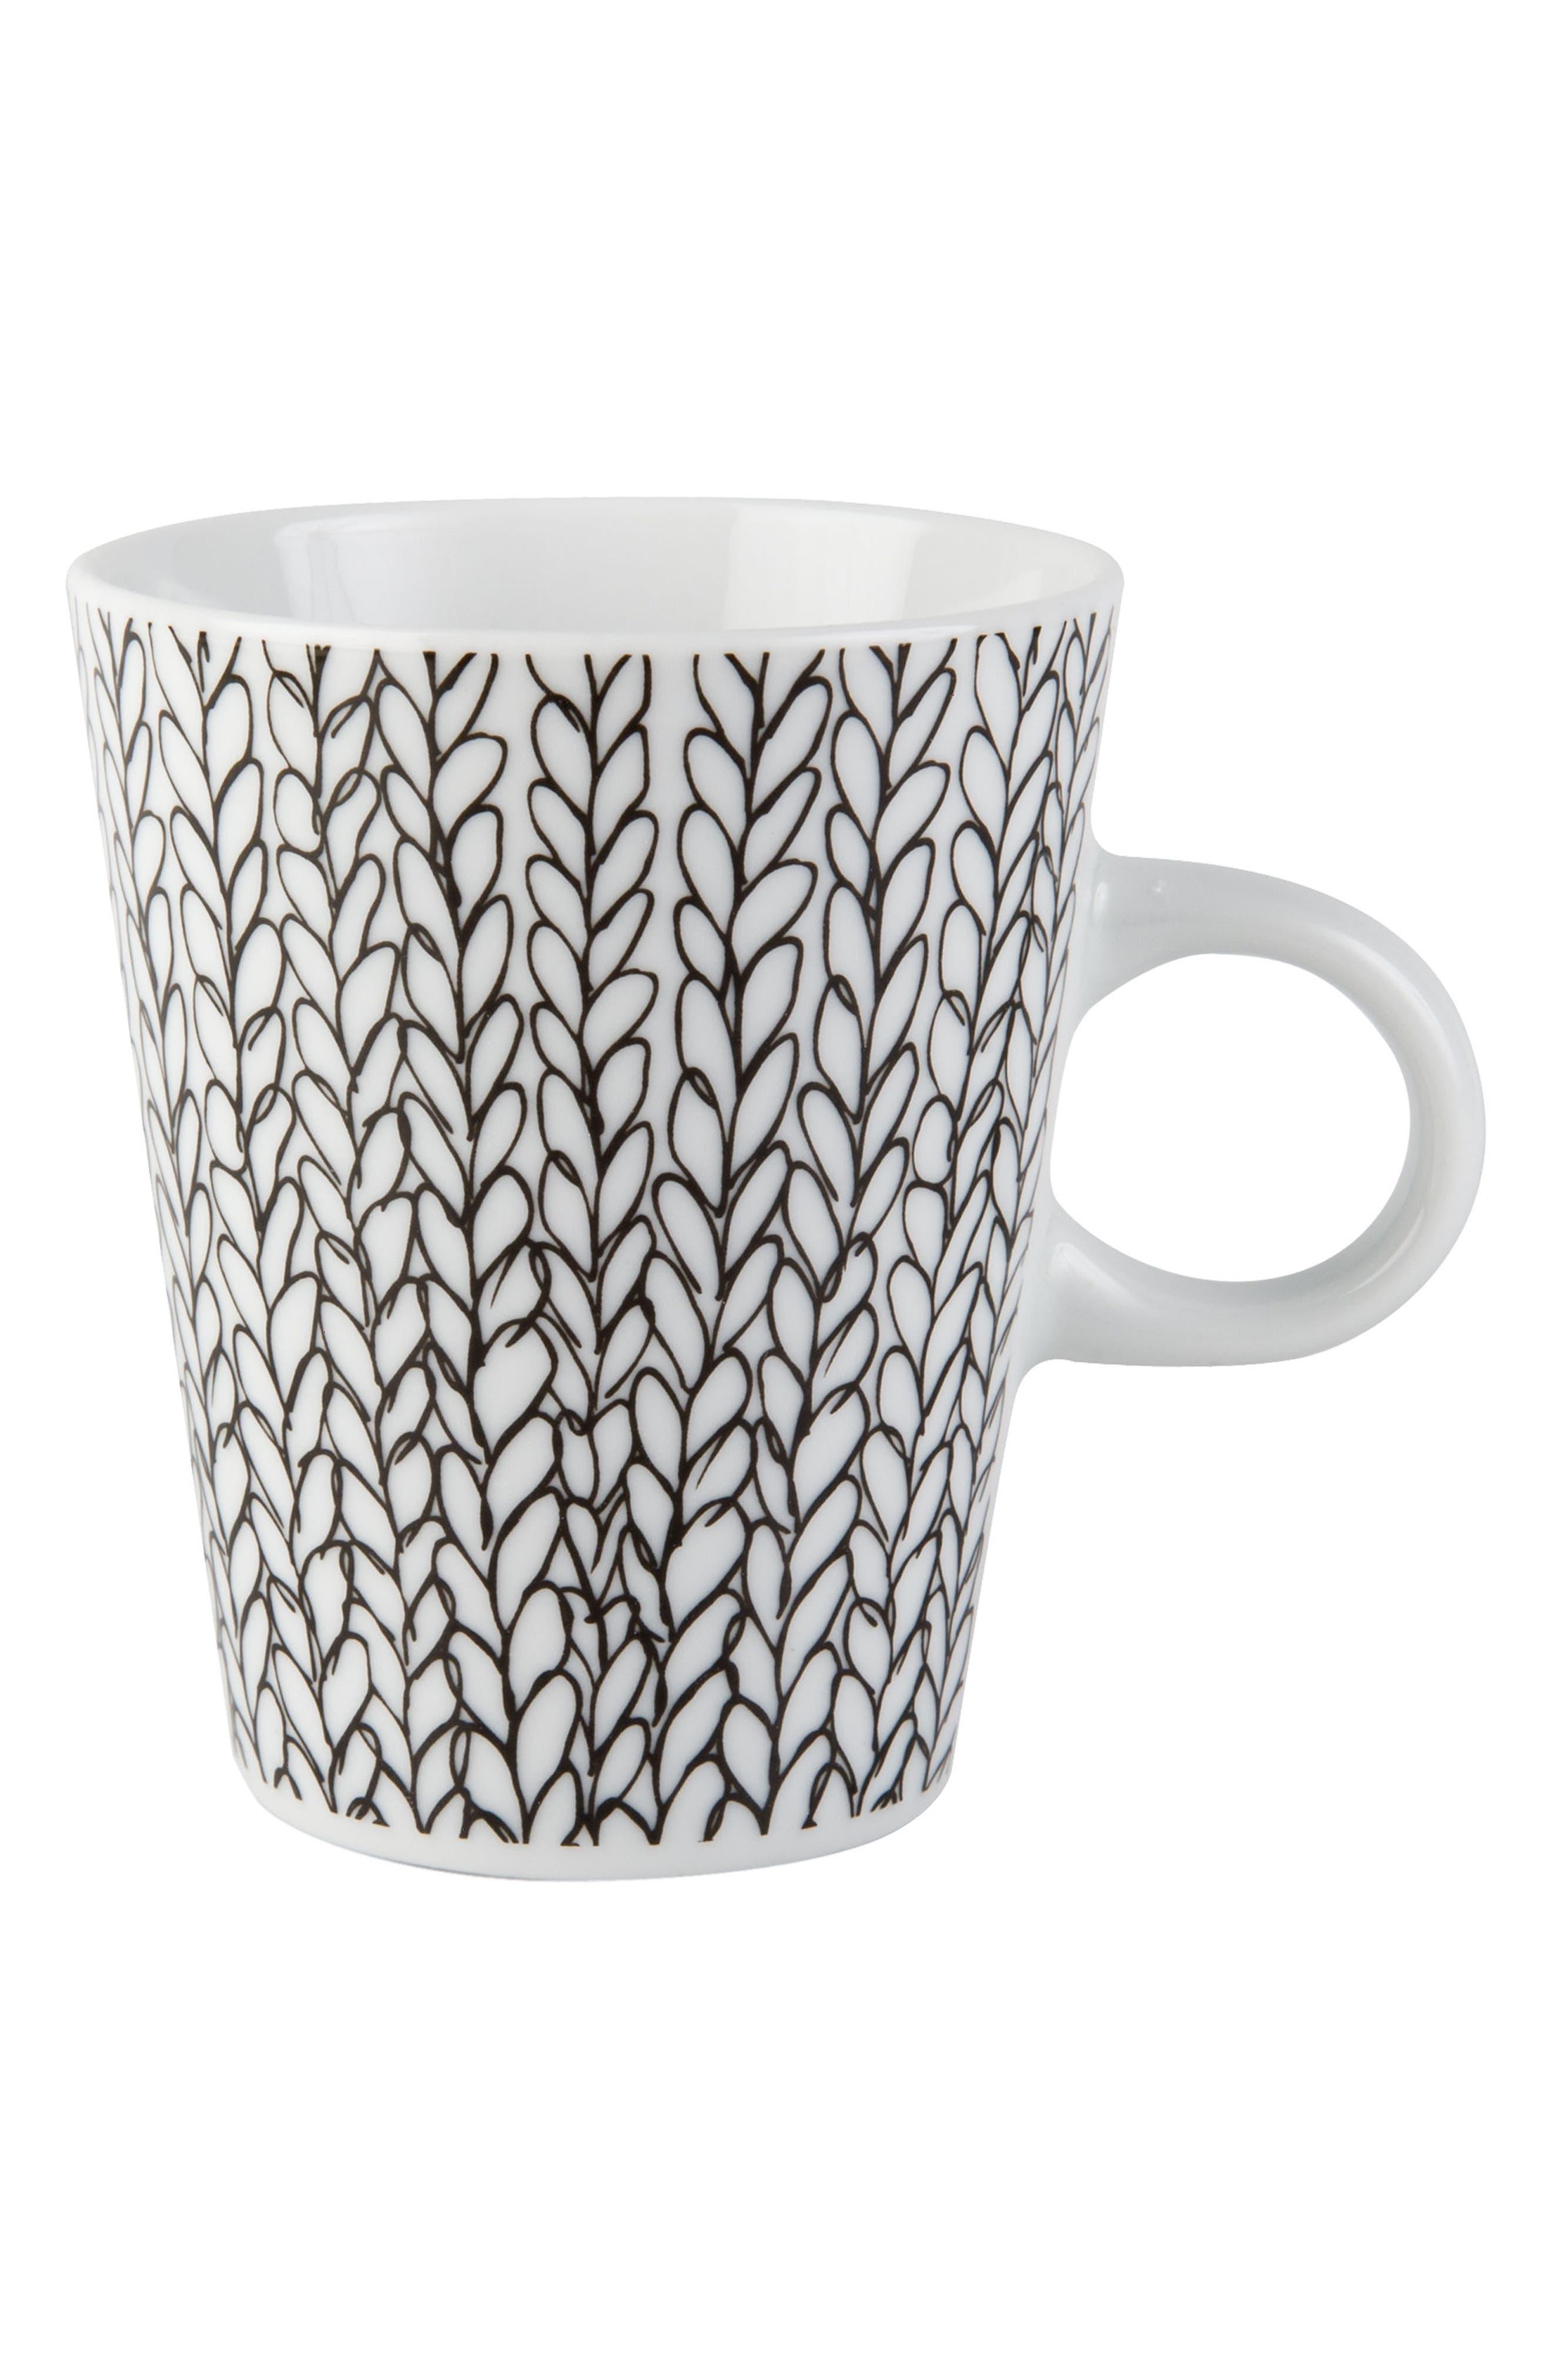 Main Image - Muurla Patterned Porcelain Mug